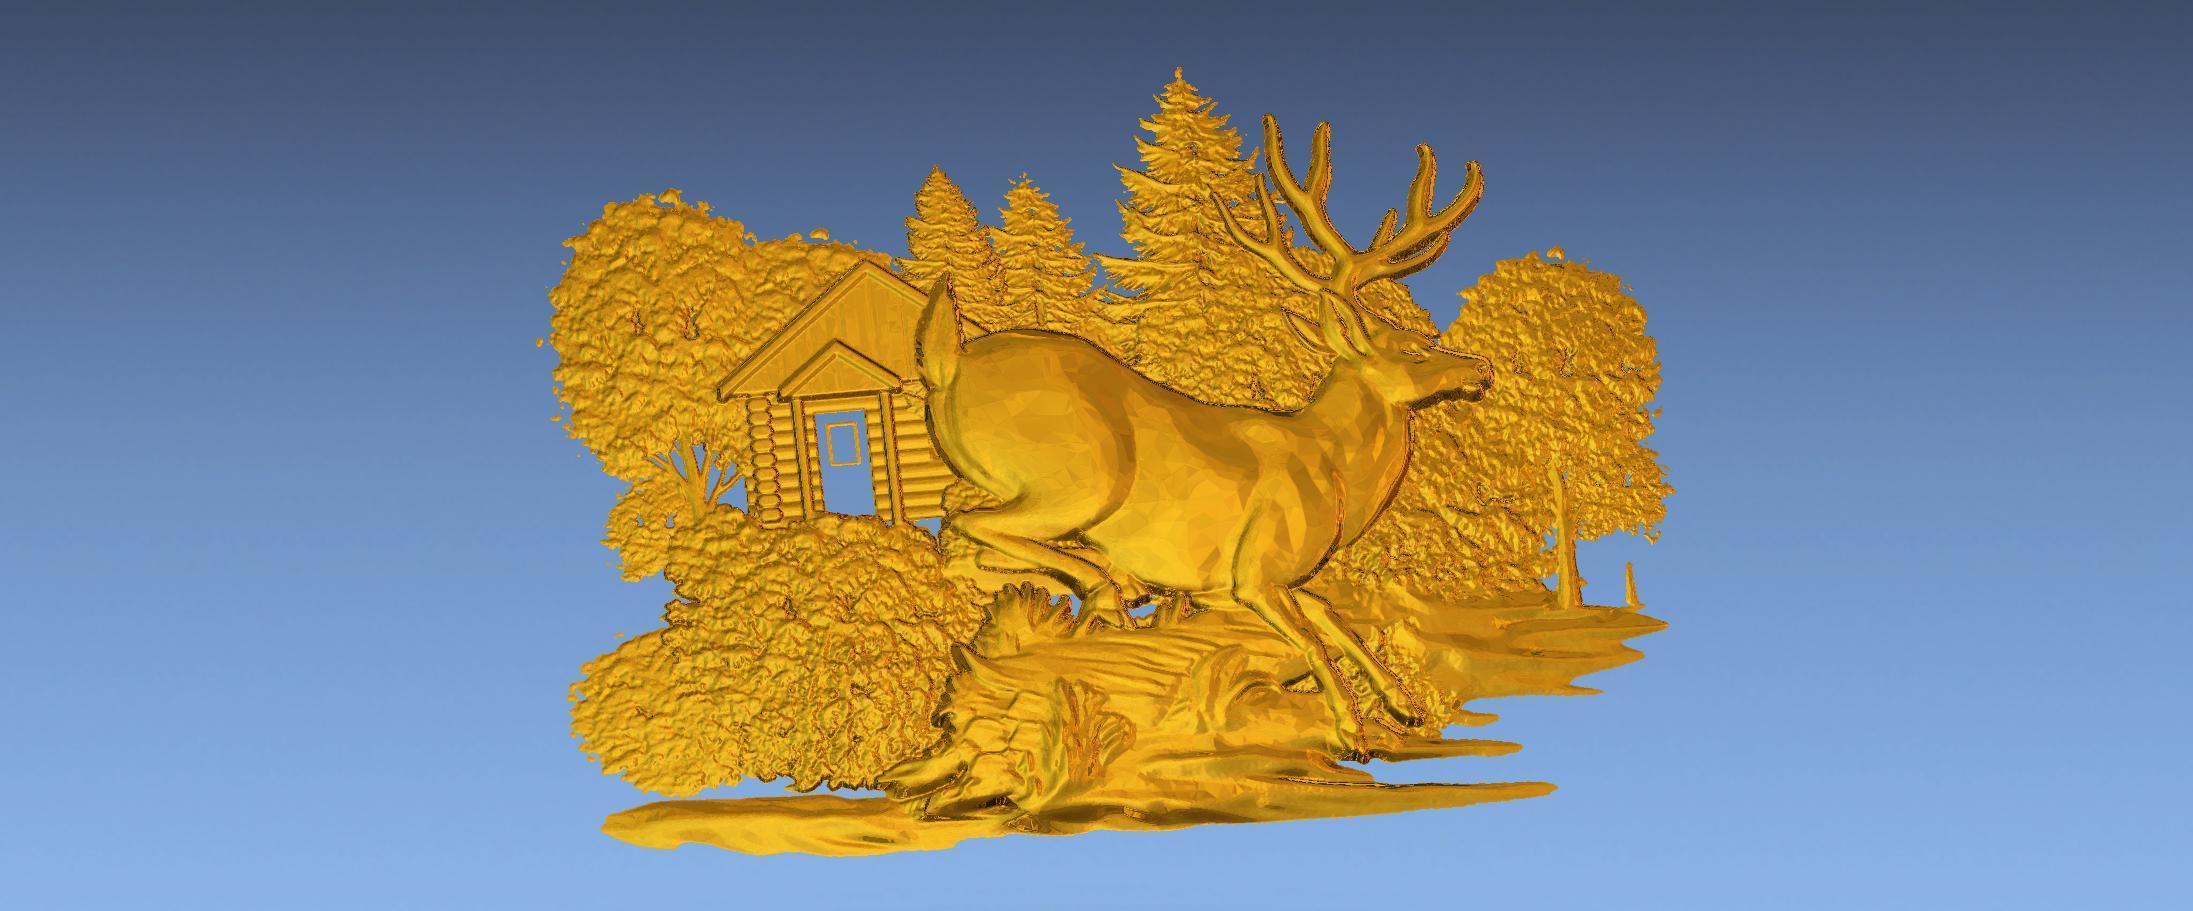 6.jpg Download free STL file 3D STL SCARED DEER • 3D print model, ALPHA_MENA